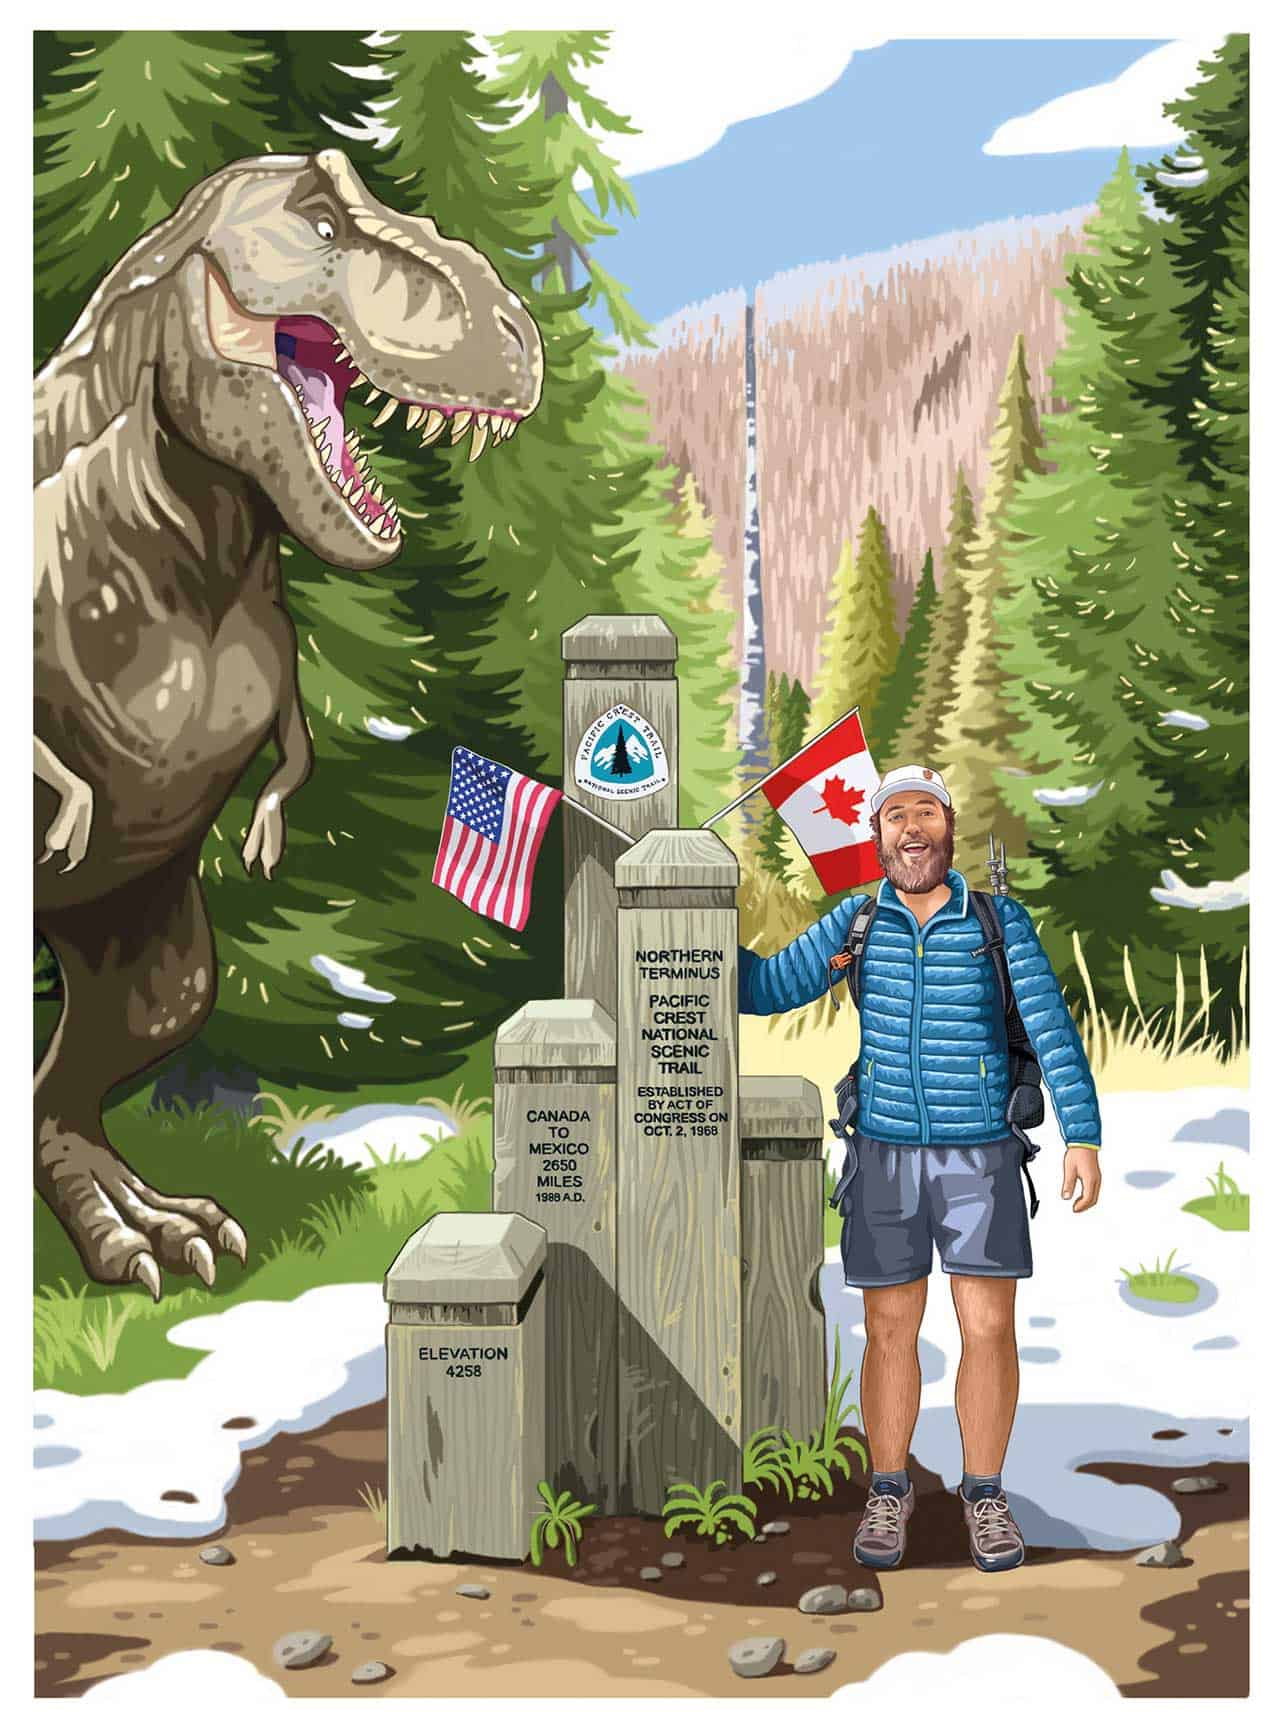 Pacific Crest Trail Northern Terminus Illustration Mac Dinosaur